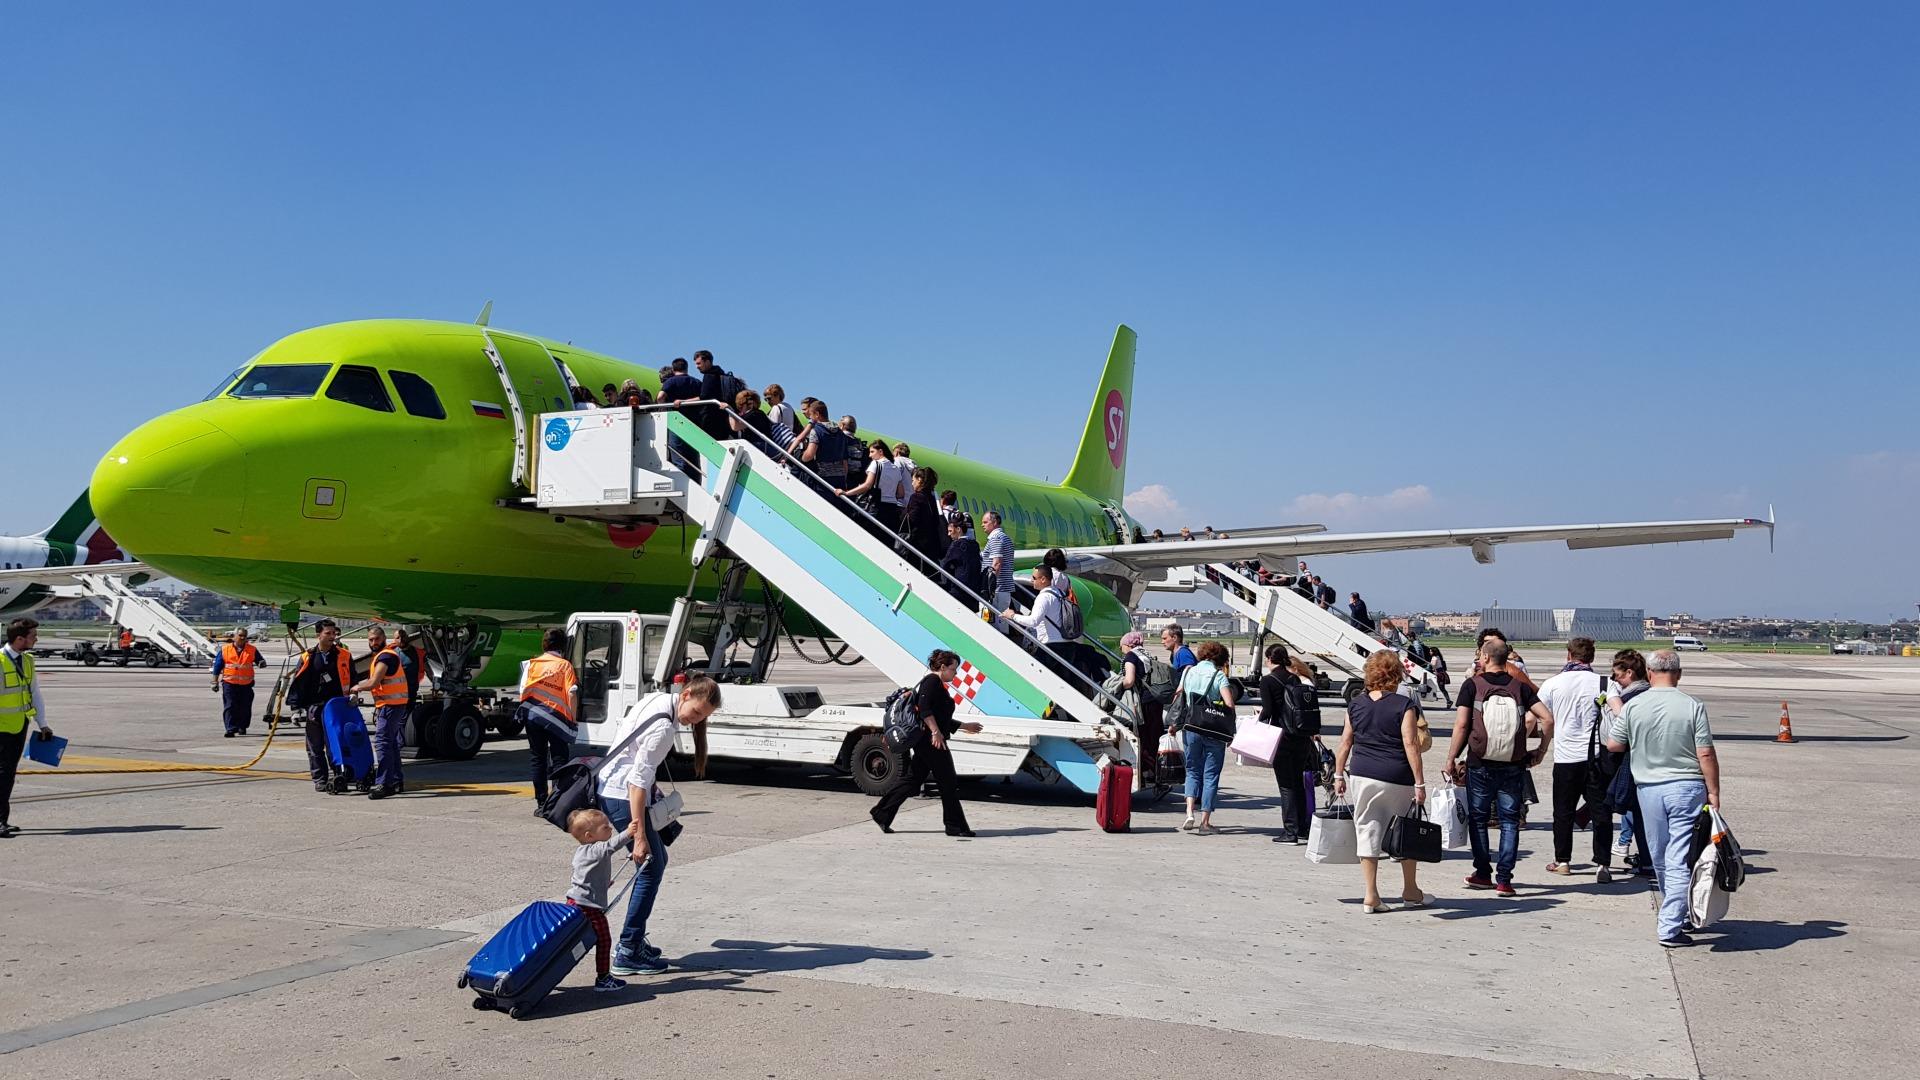 Посадка на рейс в Москву